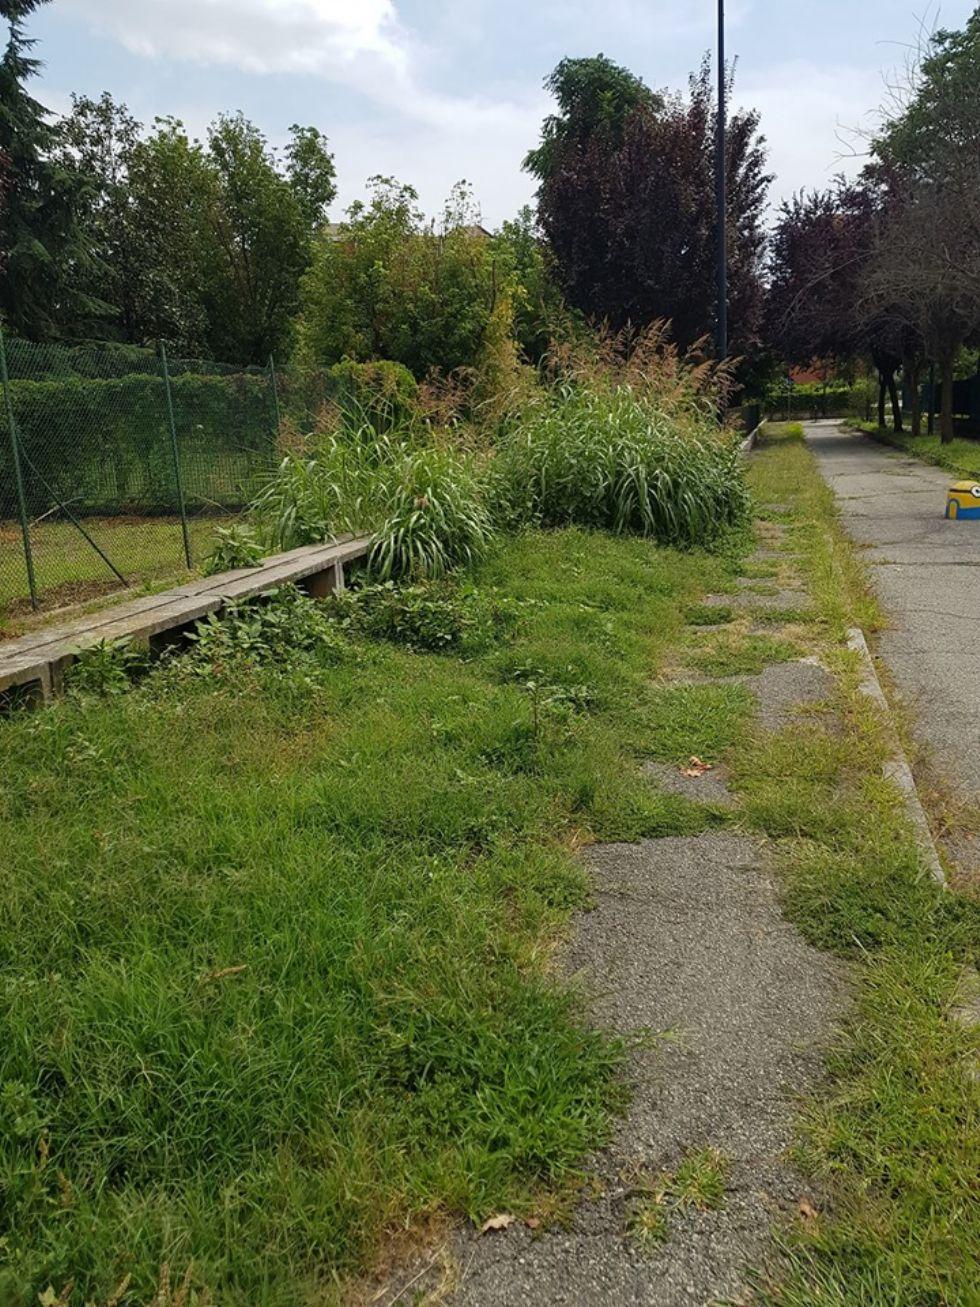 BEINASCO - L'erba alta si mangia i marciapiedi a Borgo Melano